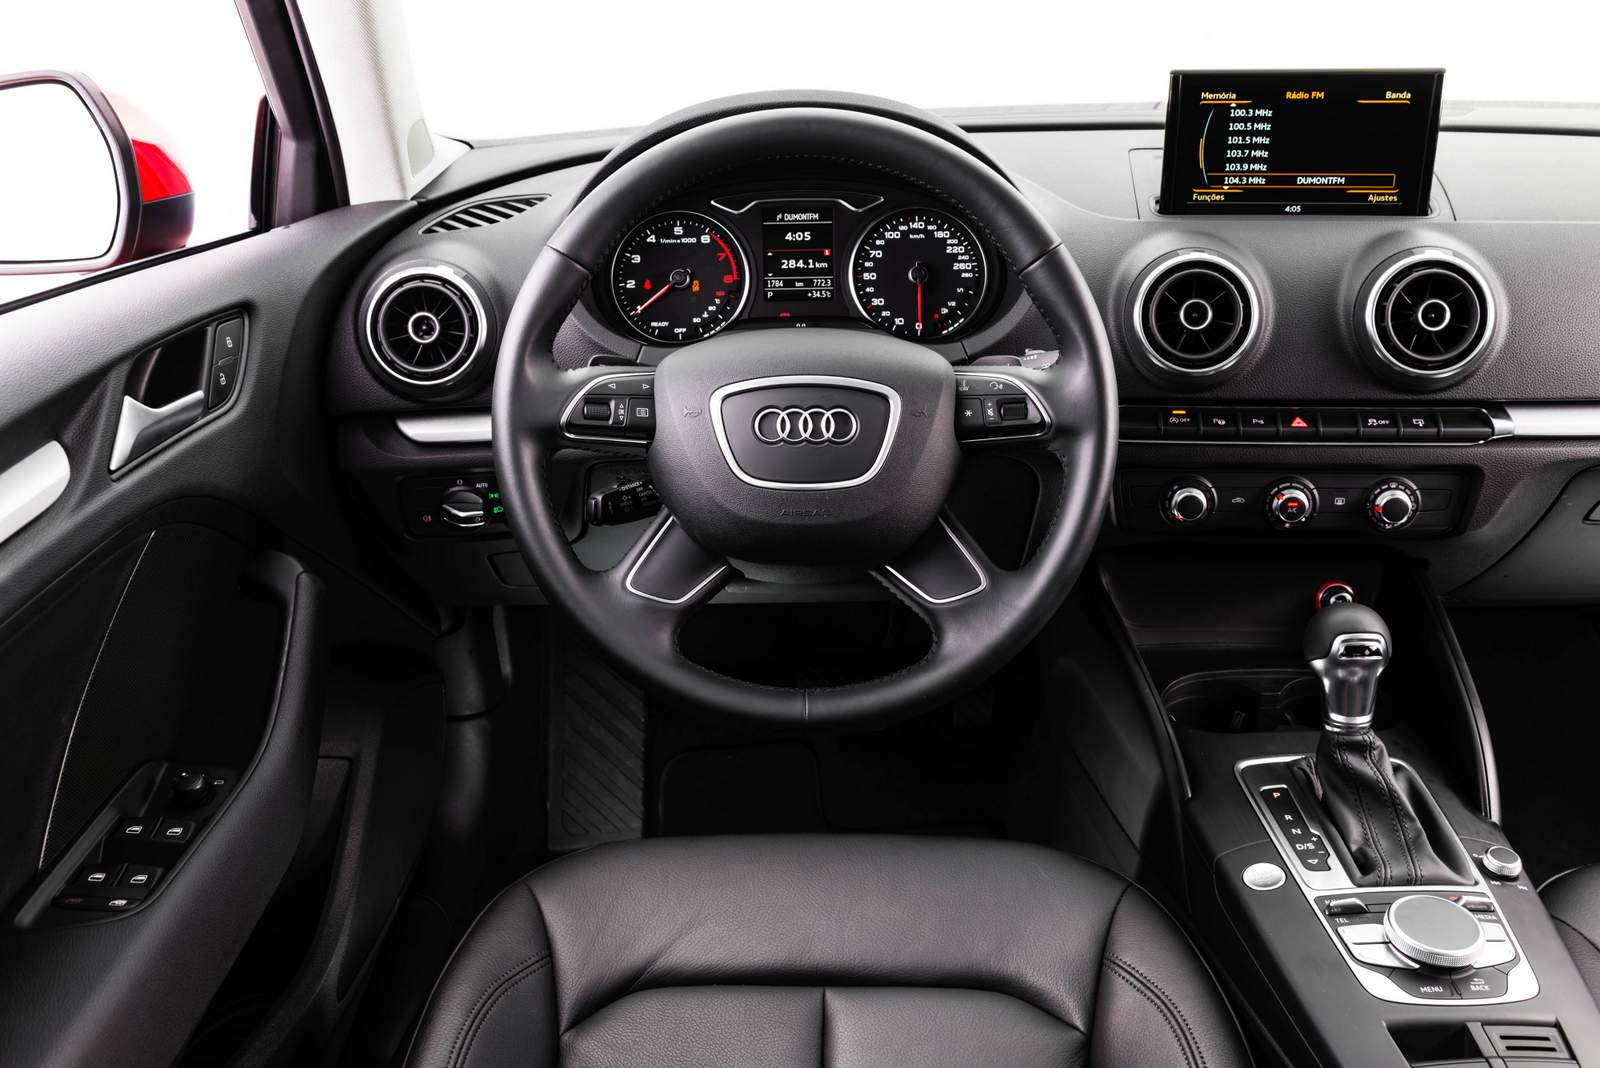 Audi A3 Sedan 2016 Flex - interior